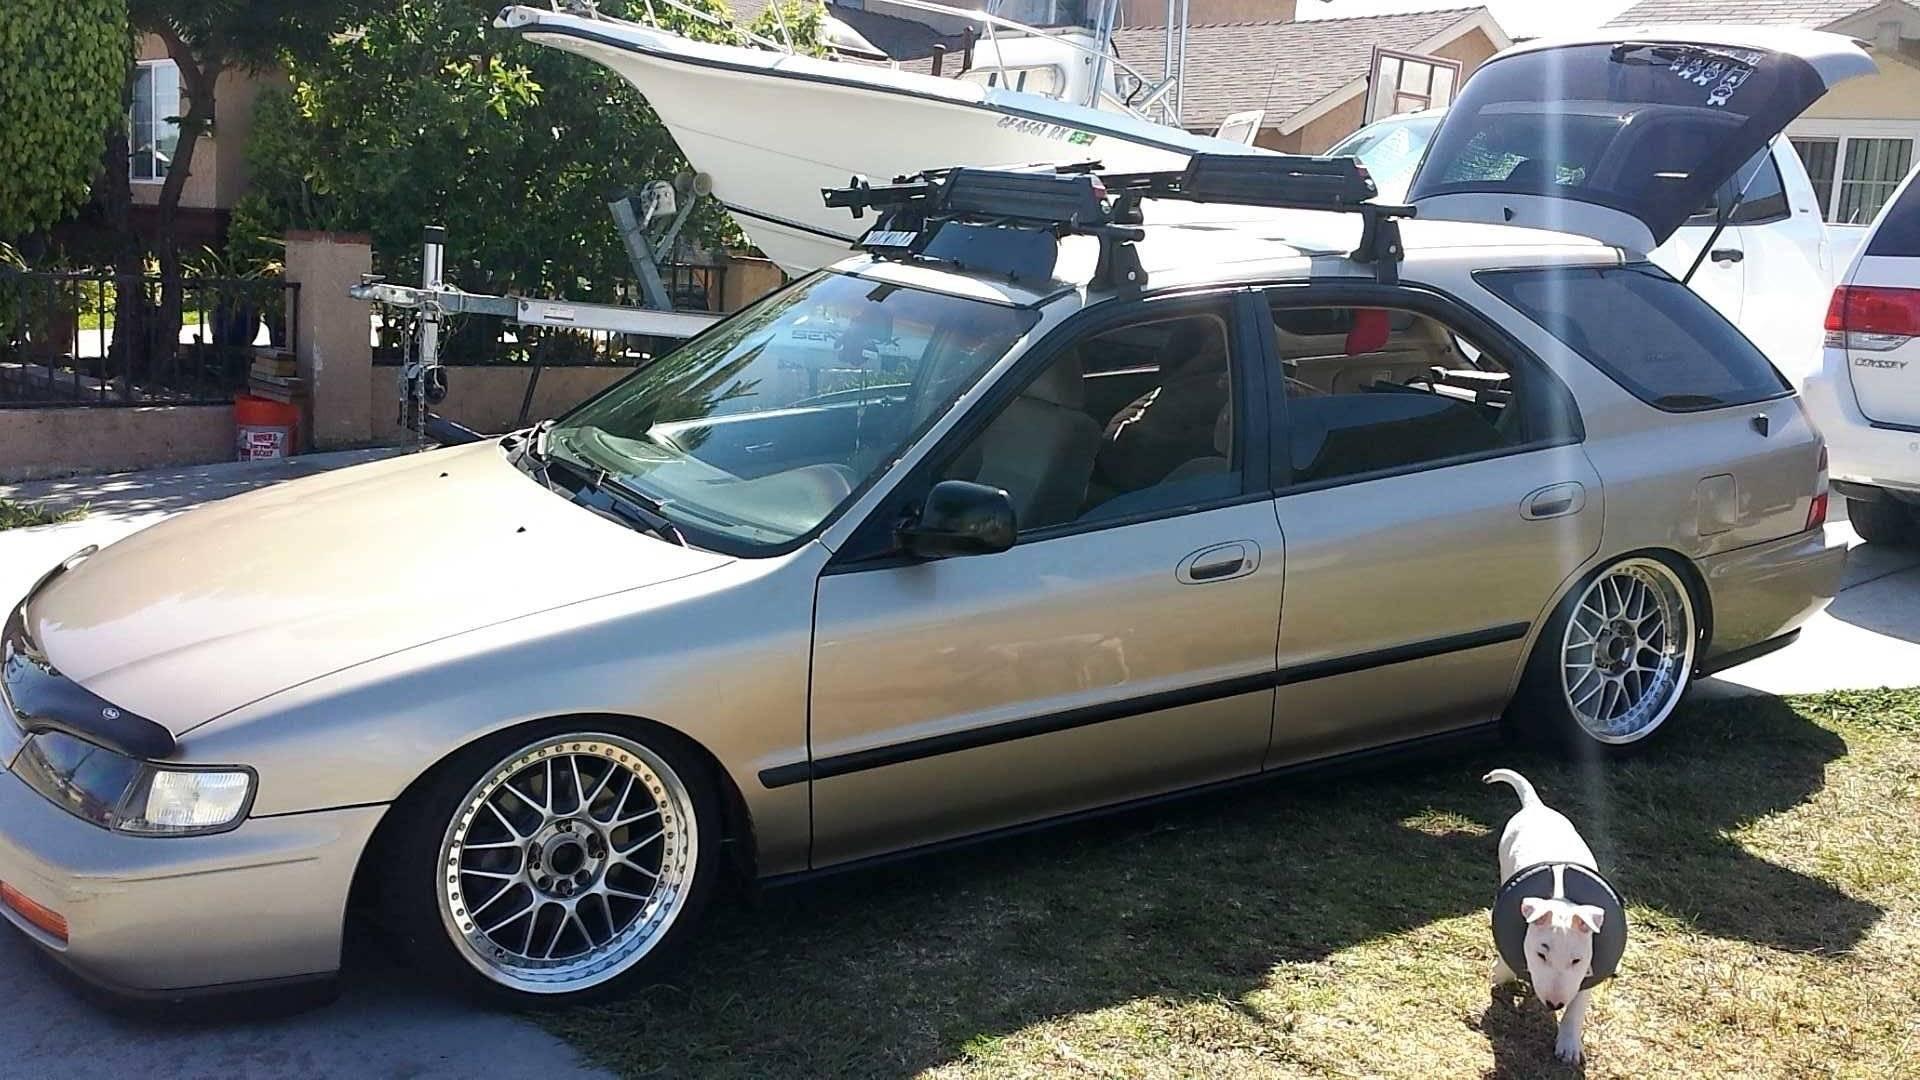 For Sale - 1995 Honda accord wagon | Bloodydecks